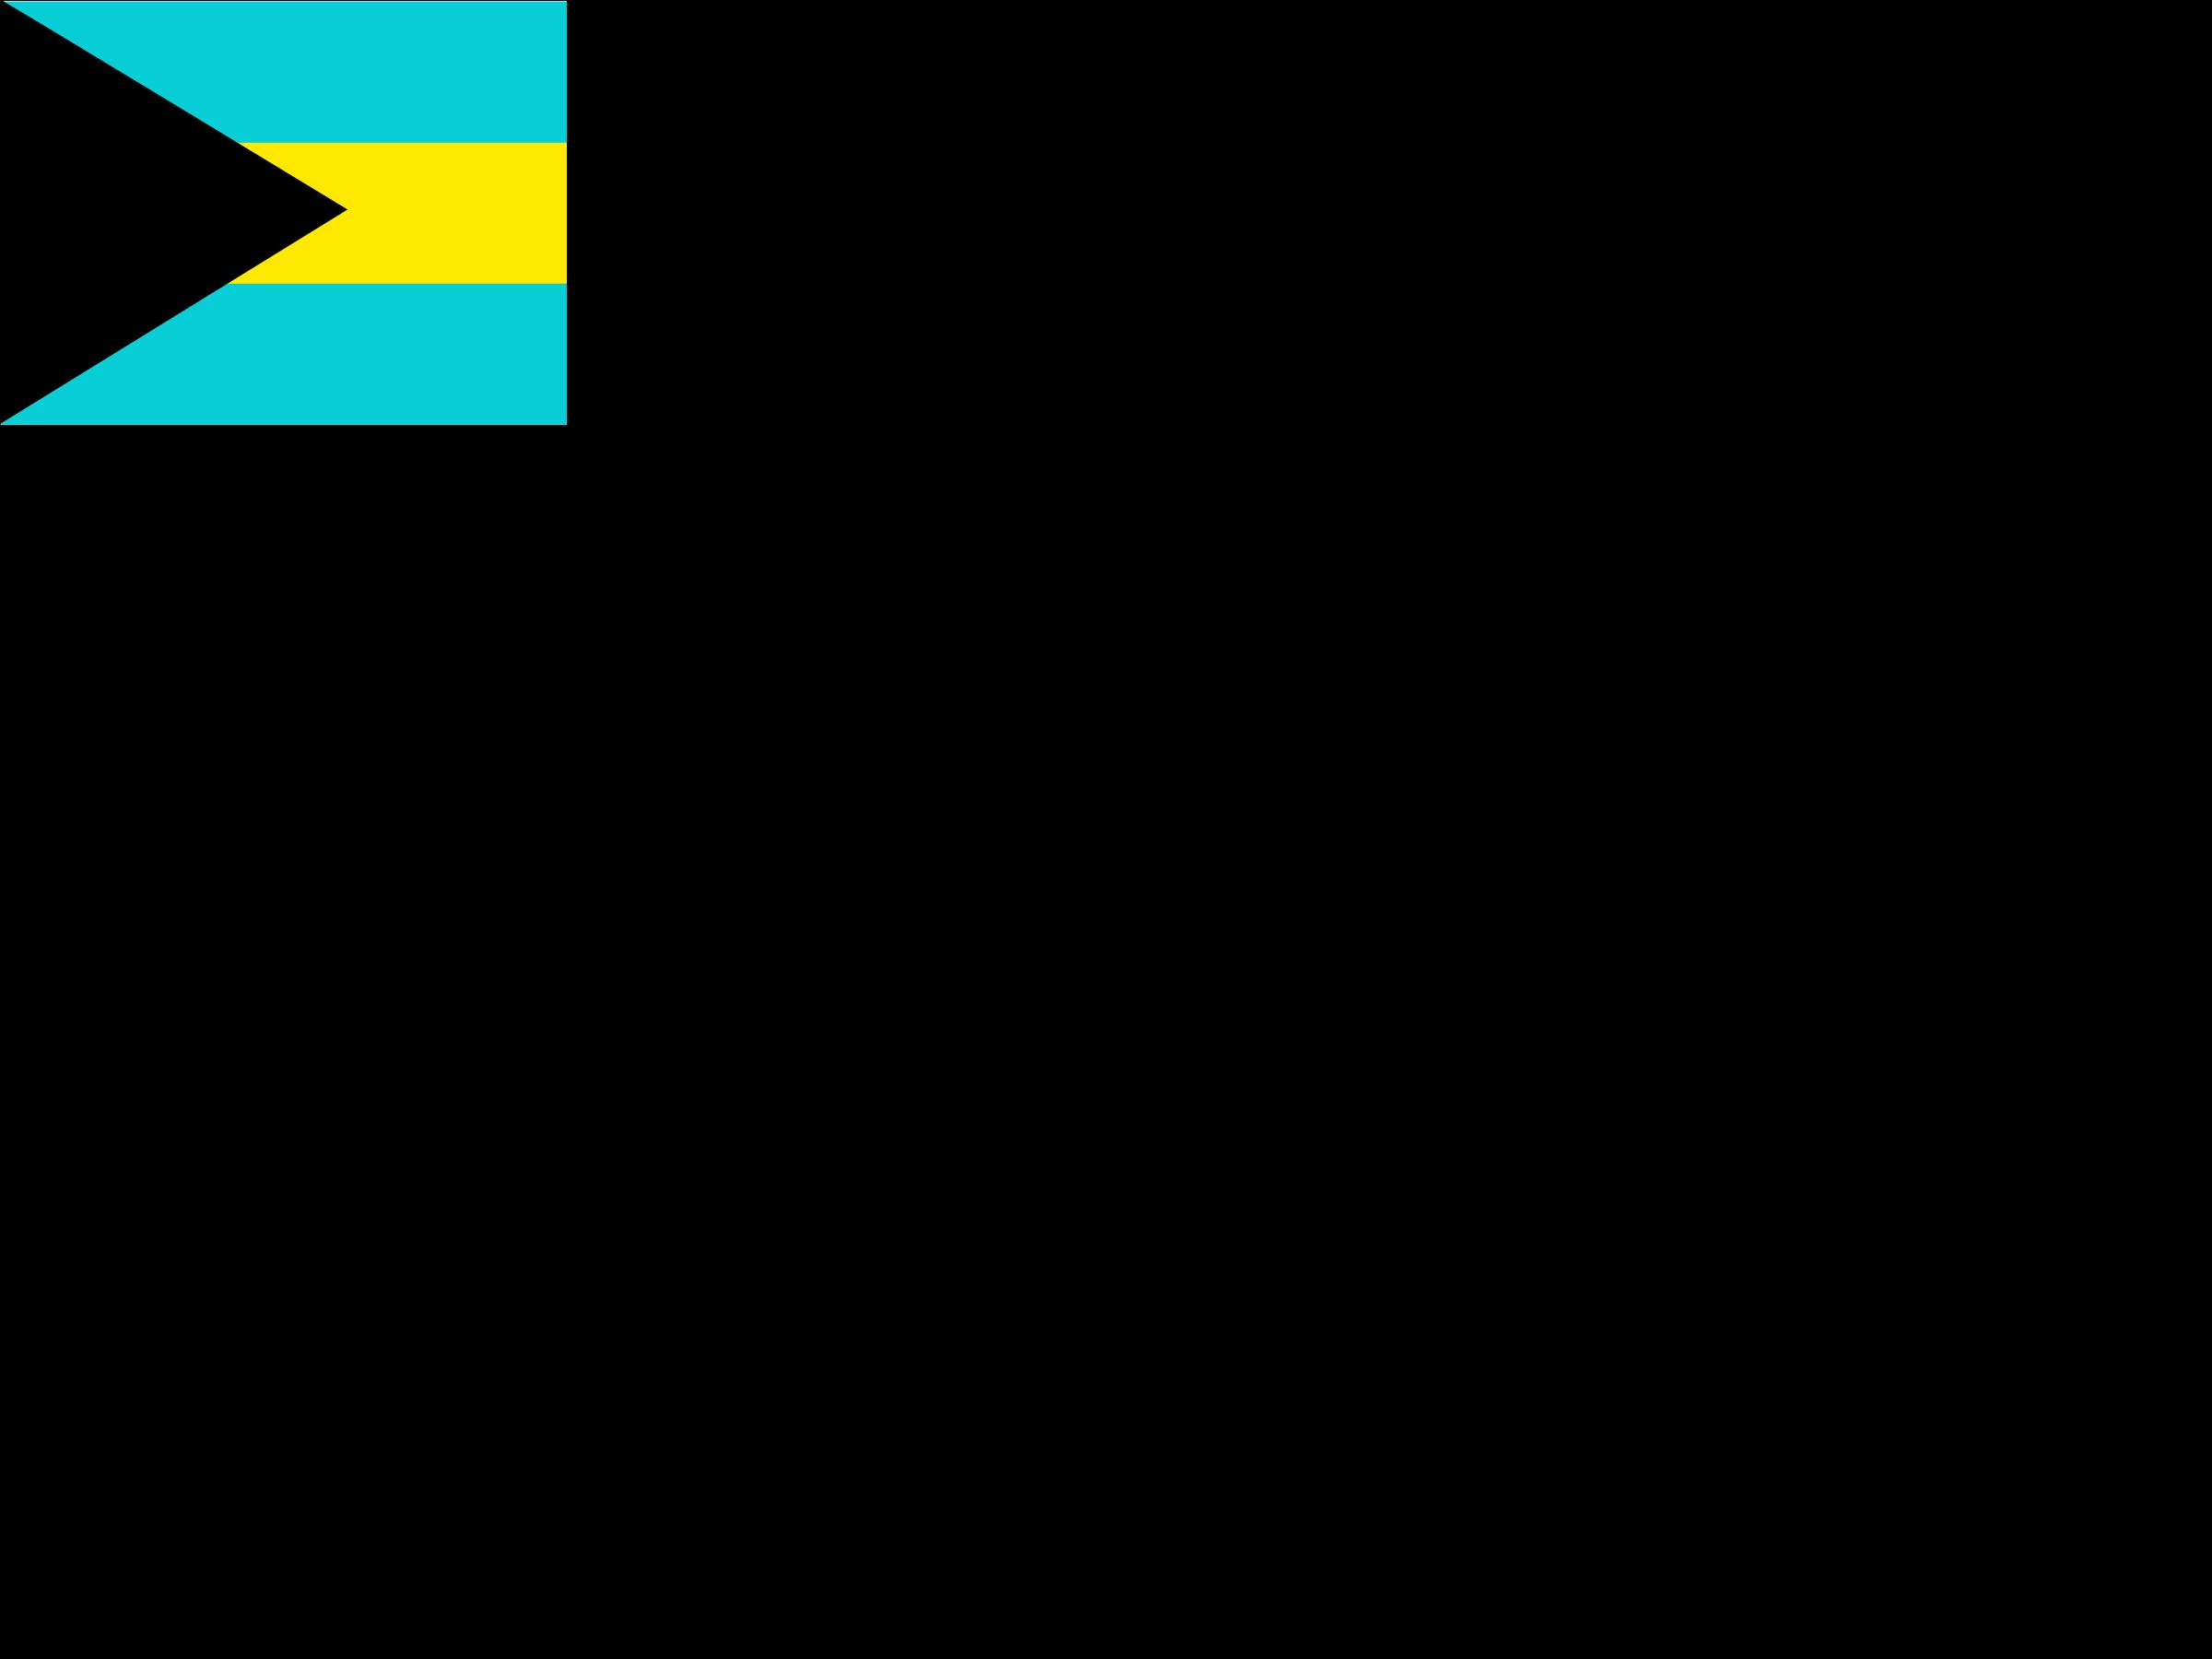 Flag of Bahamas Logo PNG Transparent & SVG Vector.